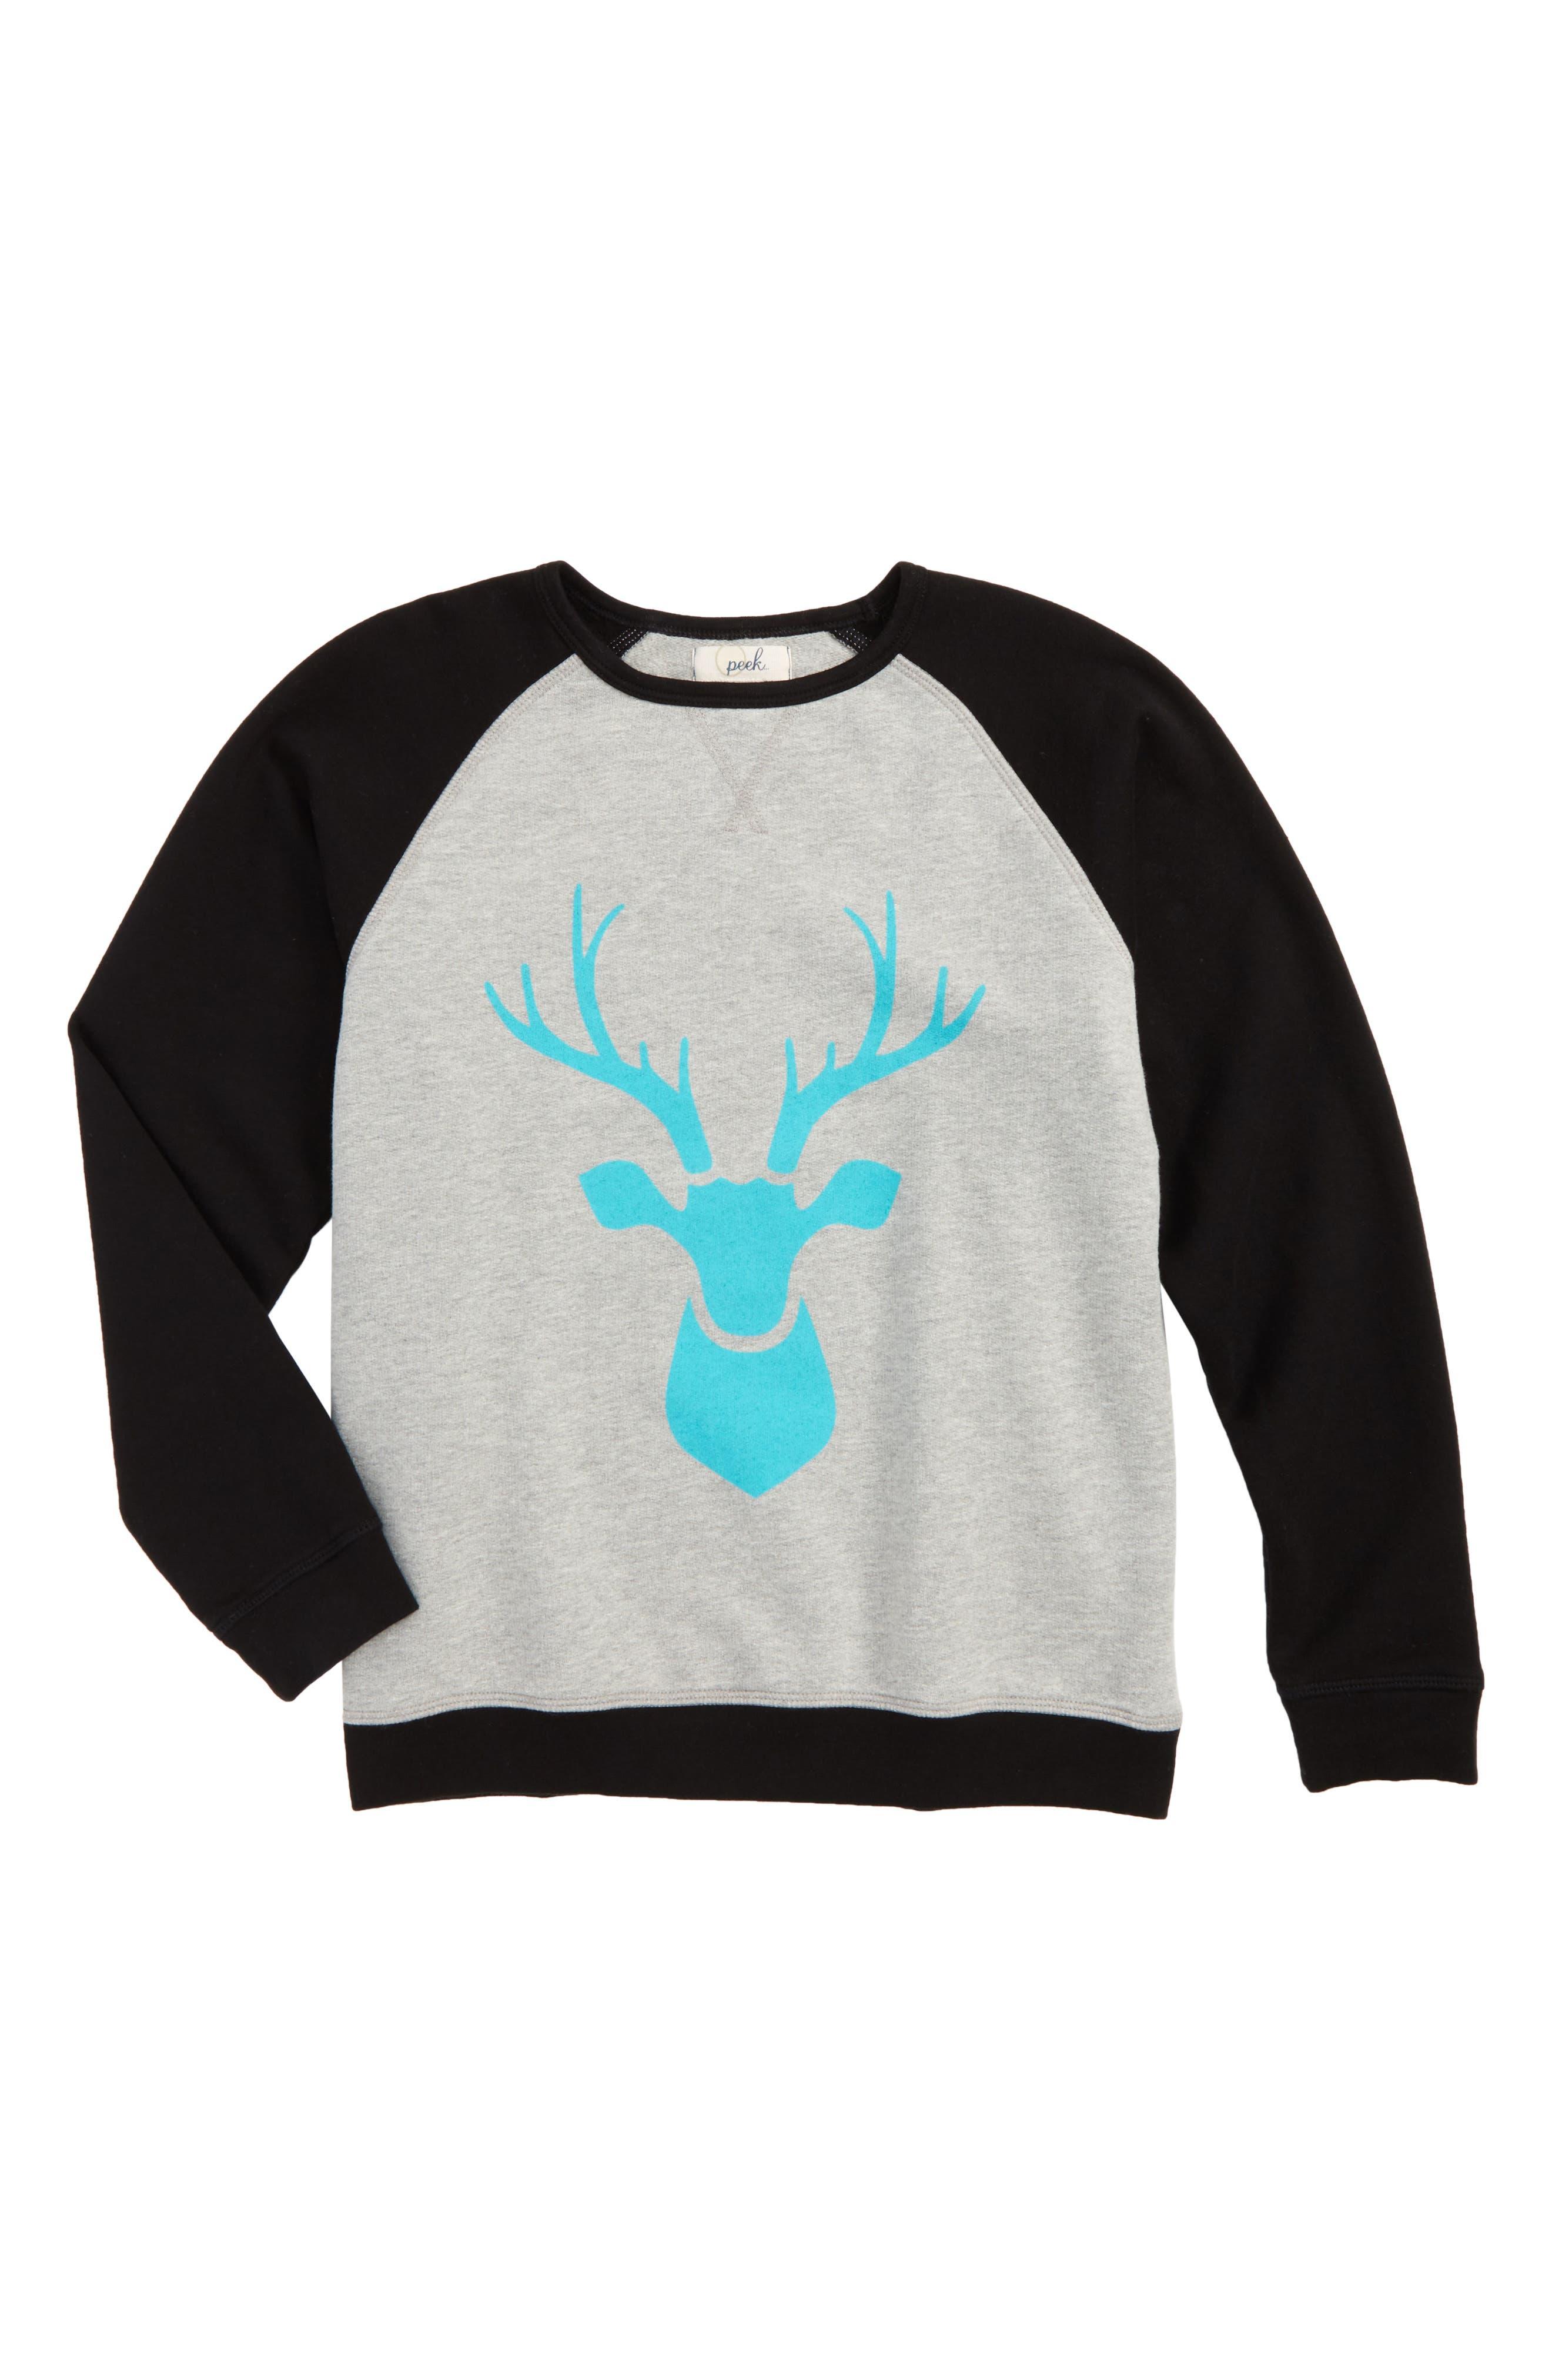 Peek Reindeer Graphic Raglan Sweatshirt (Toddler Boys, Little Boys & Big Boys)